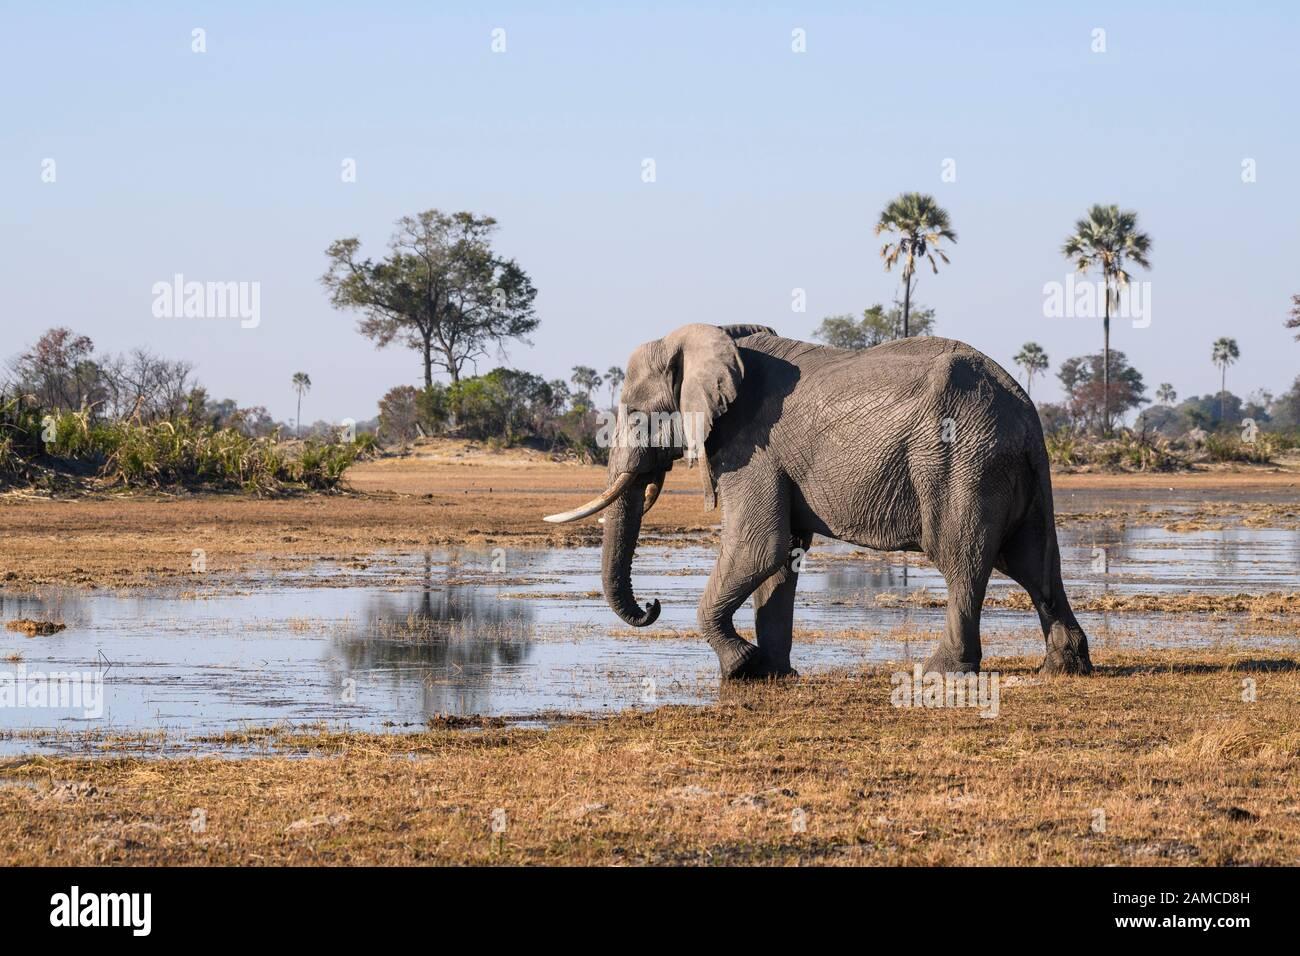 Male African Elephant, Loxodonta africana, wearing a tracking collar, Macatoo, Okavango Delta, Botswana Stock Photo